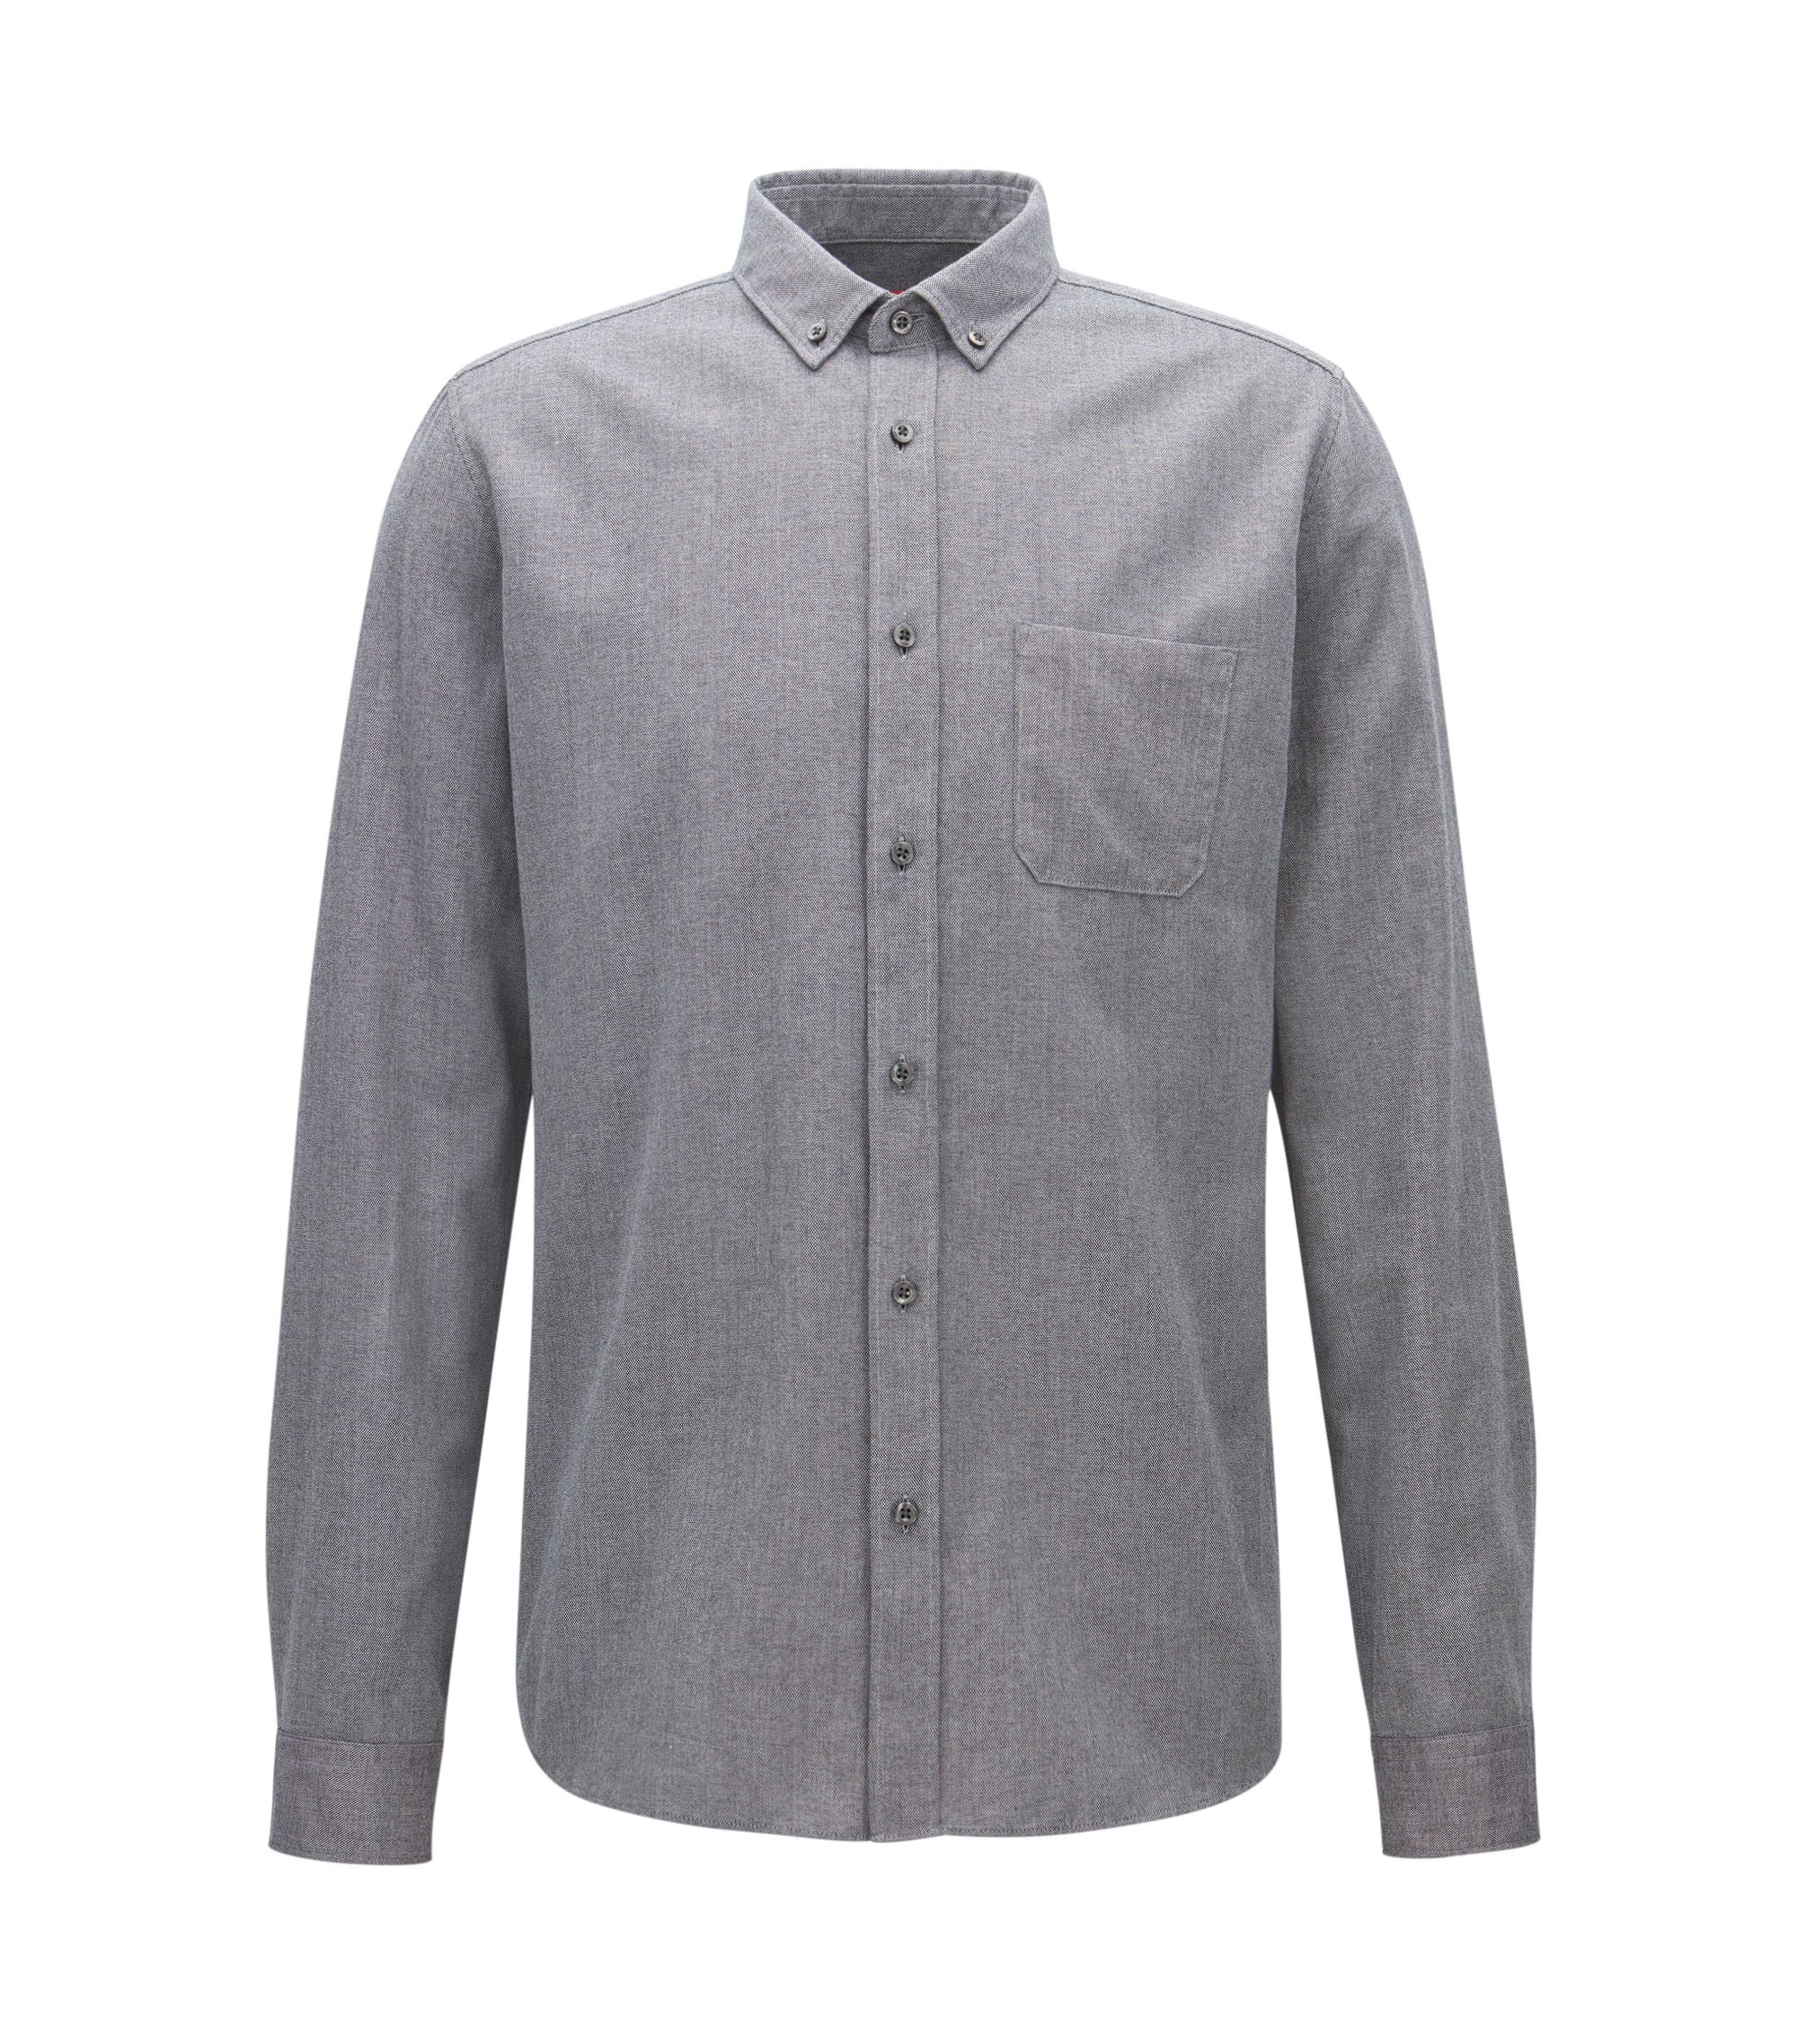 Relaxed-Fit Hemd aus mittelschwerem Cord, Anthrazit